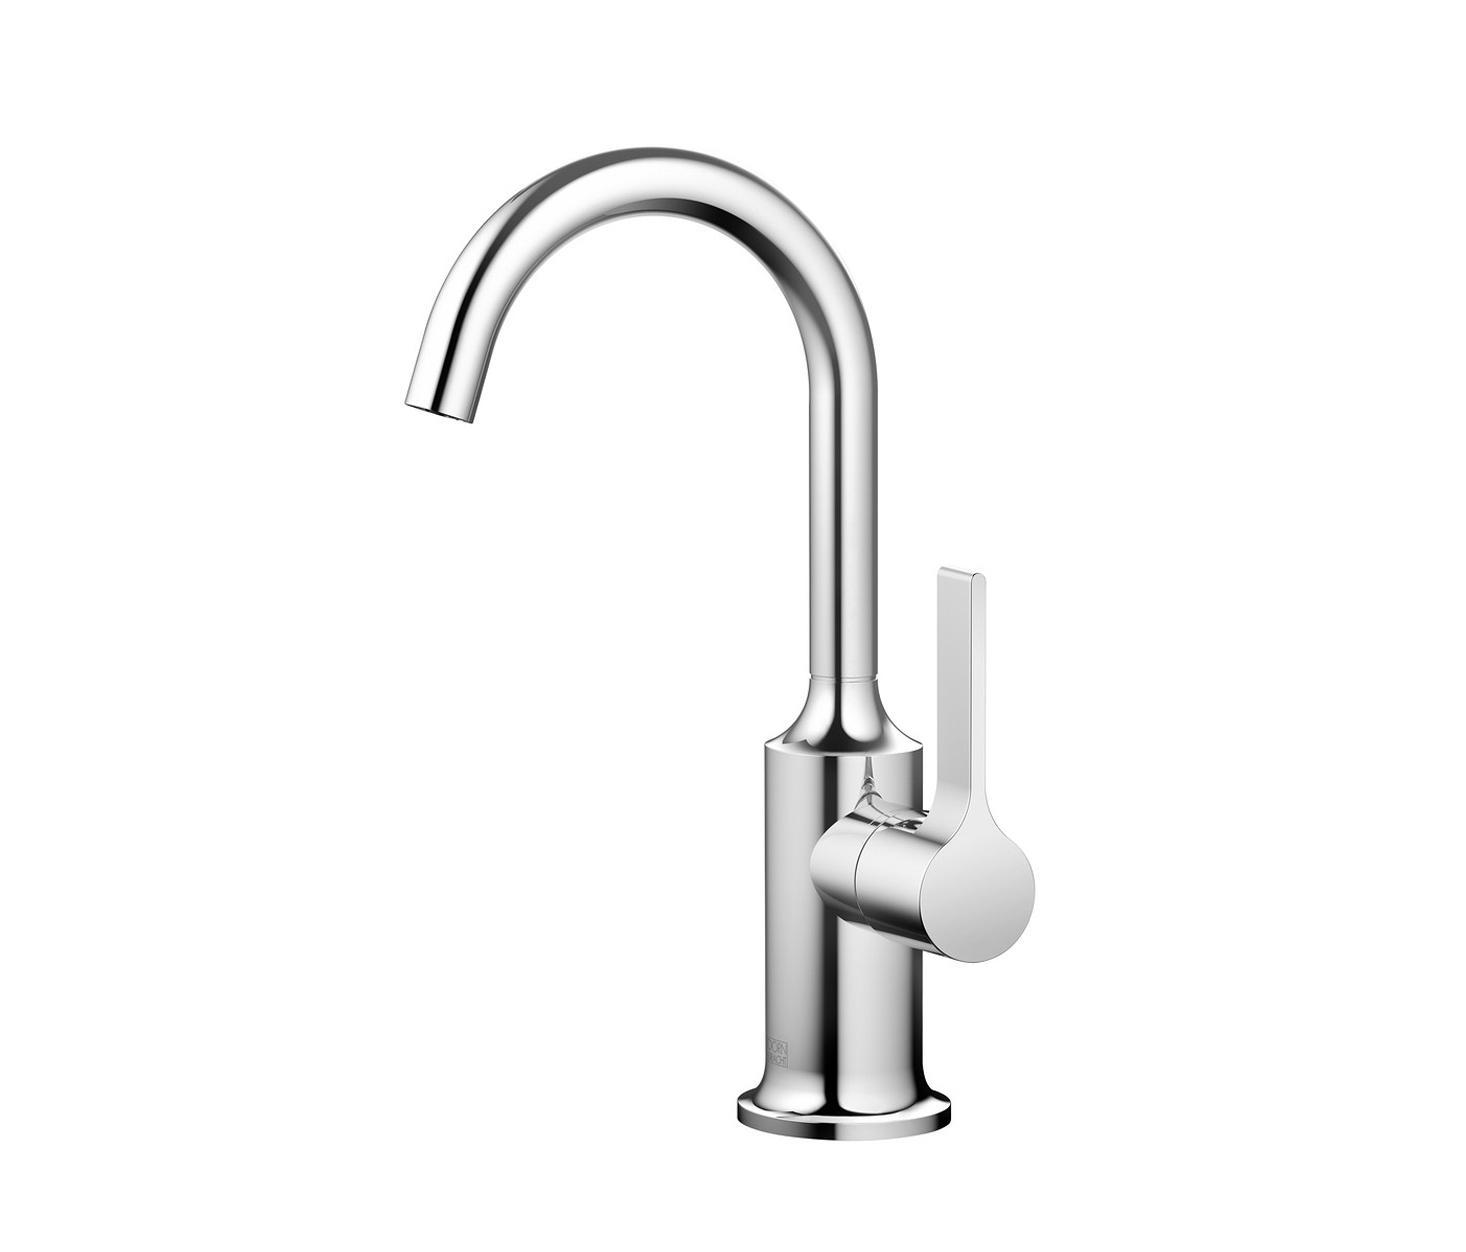 vaia single lever basin mixer wash basin taps from. Black Bedroom Furniture Sets. Home Design Ideas